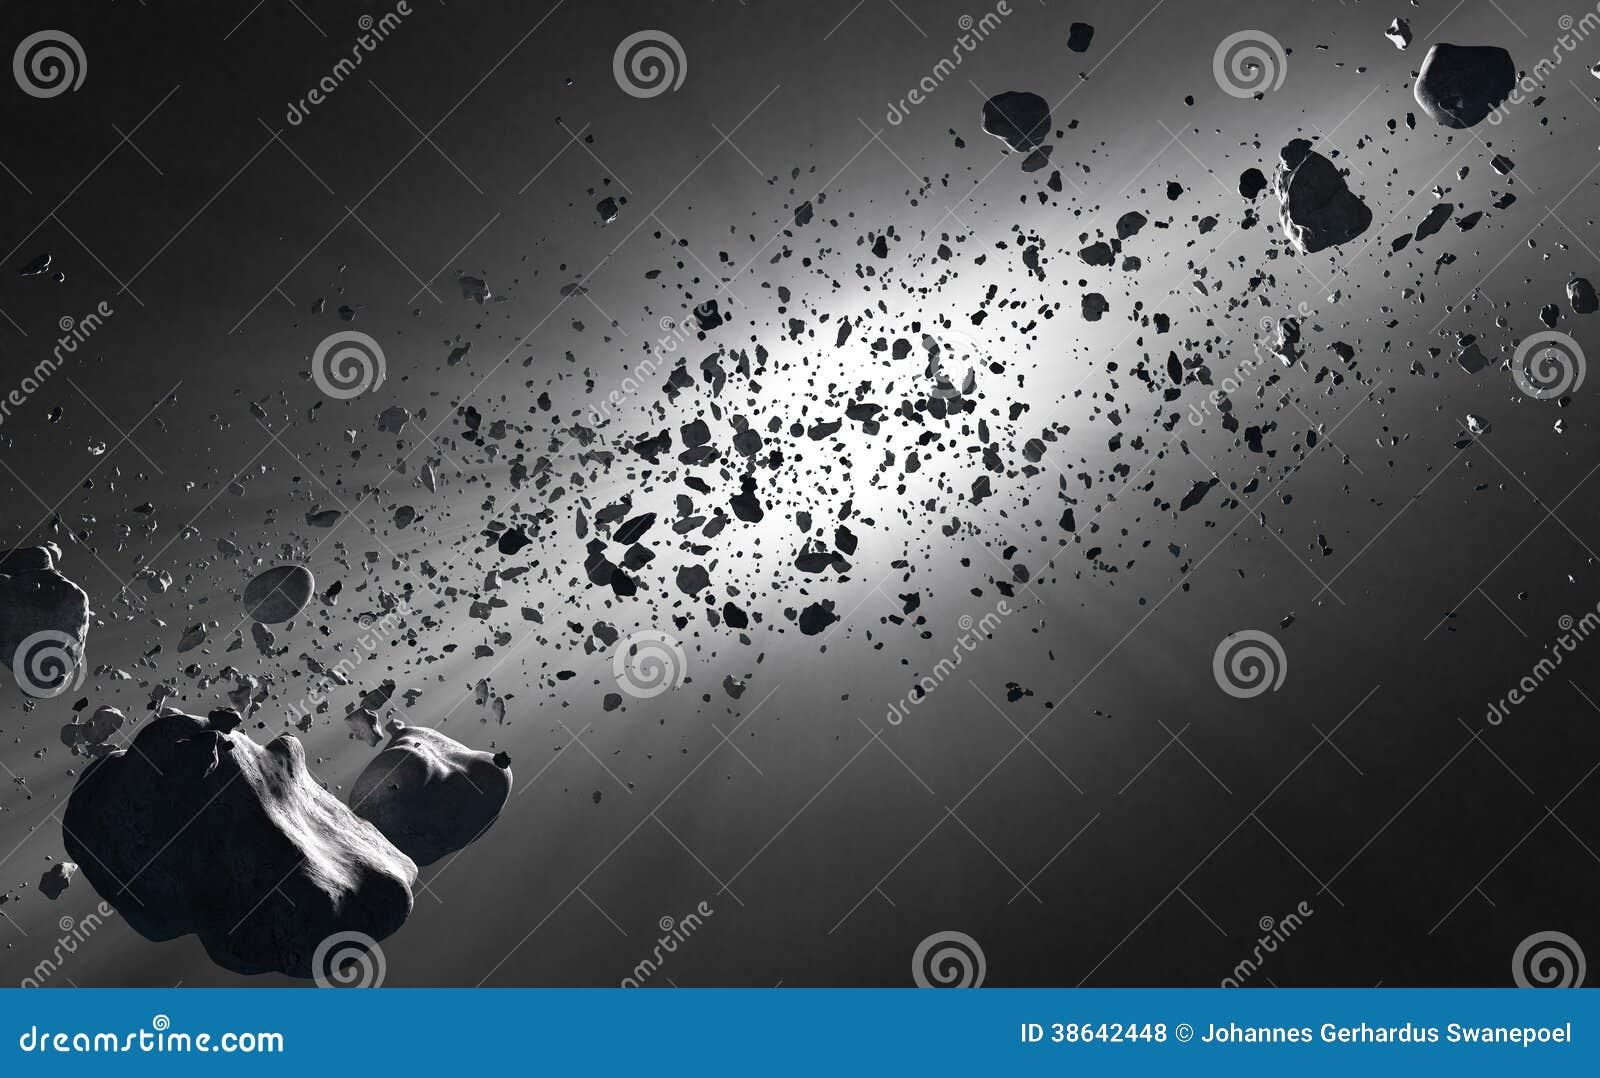 asteroid belt white background - photo #41